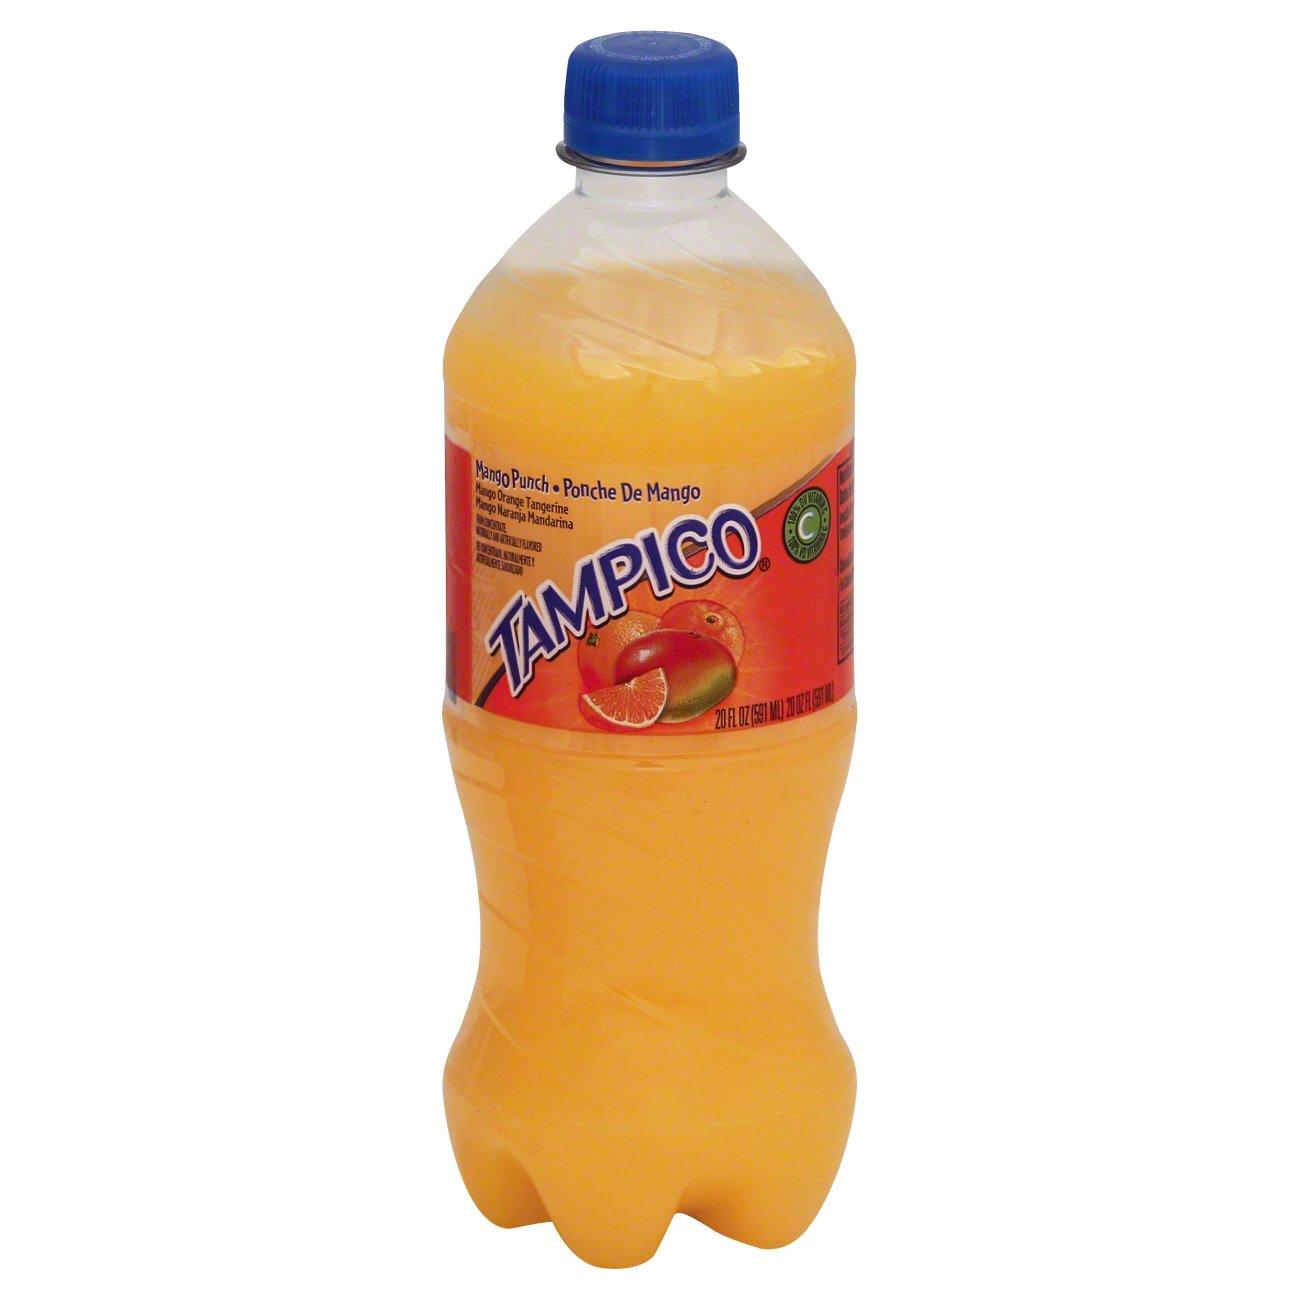 Tampico Mango Punch ‑ Shop Juice at H‑E‑B